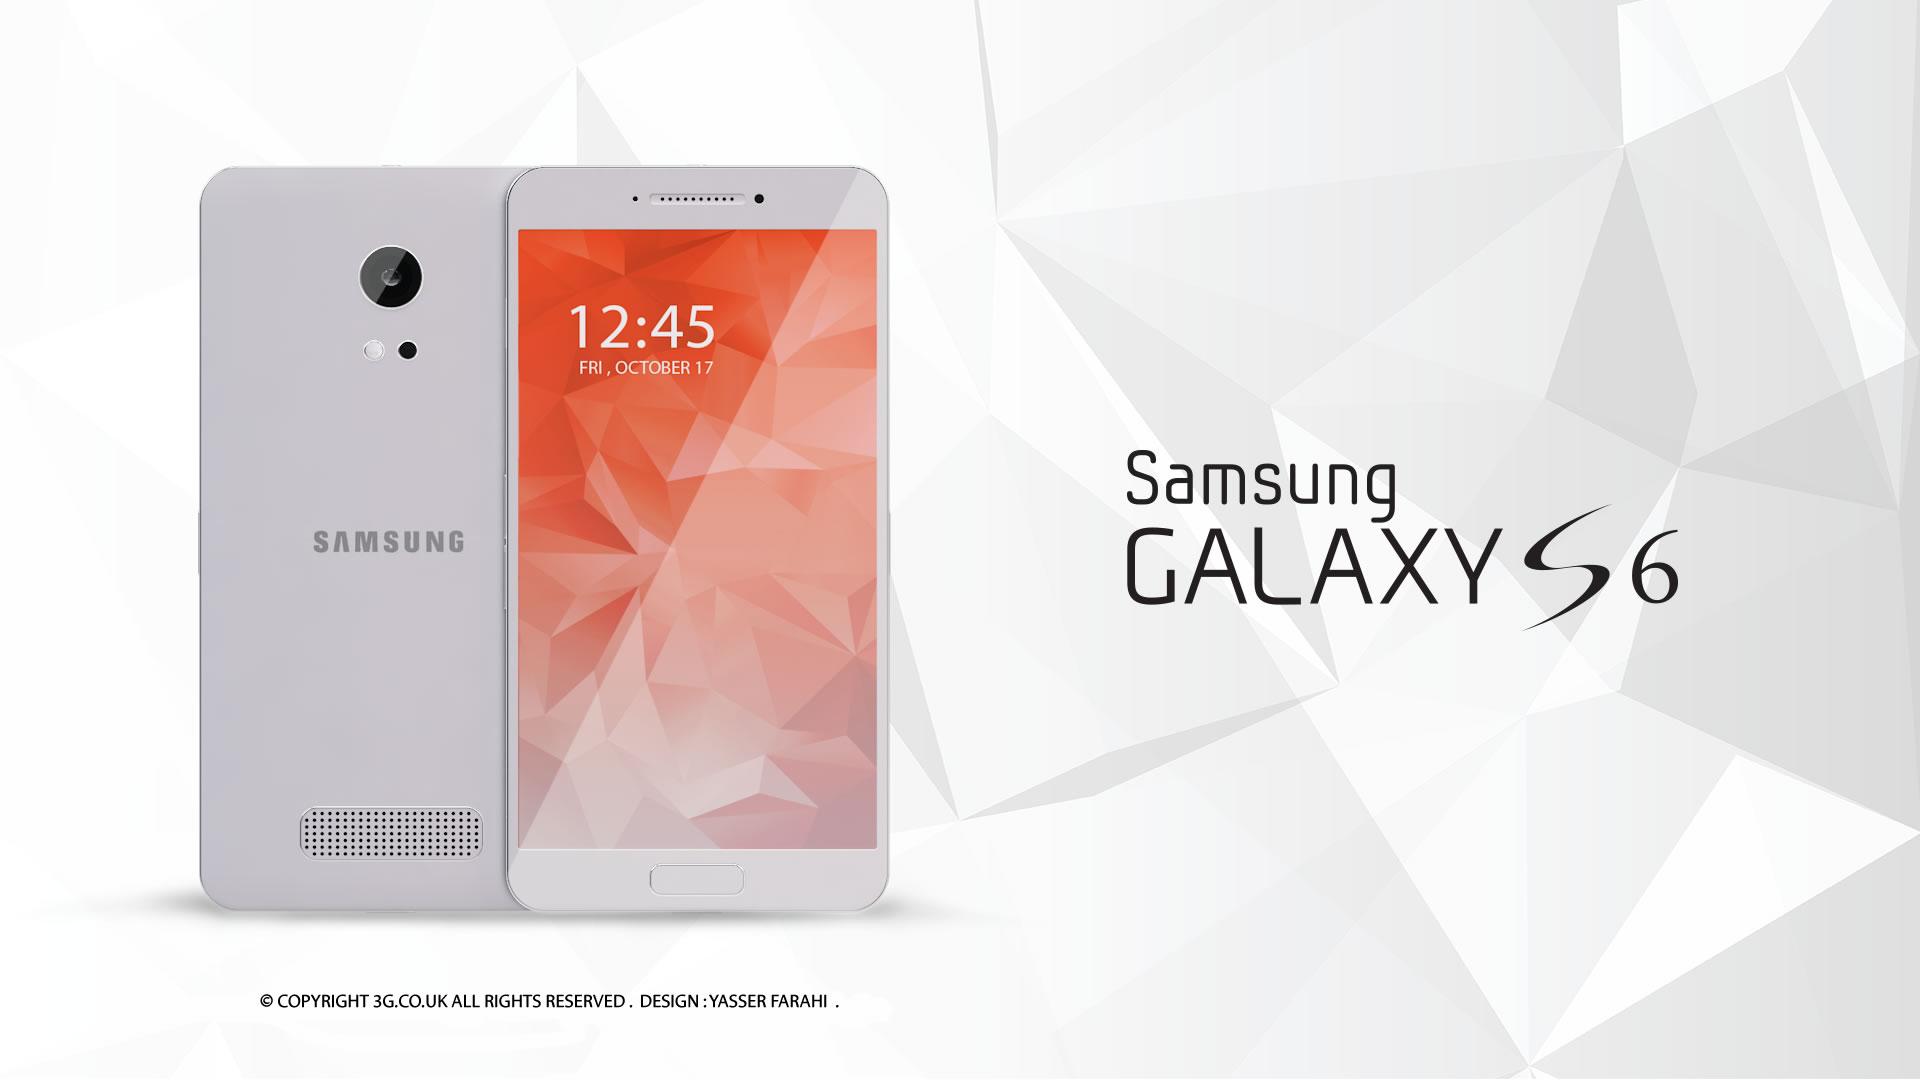 Samsung-Galaxy-S6-design-concept (2)